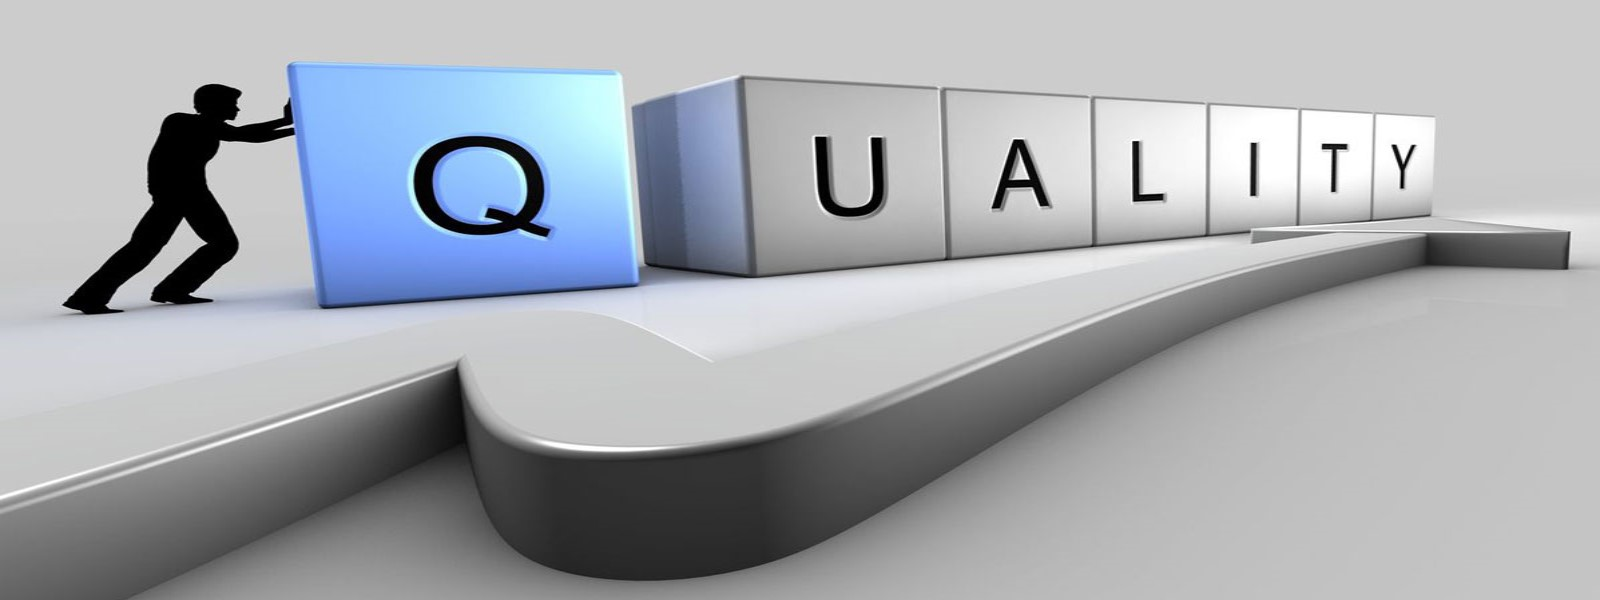 ISO 9001 Ποιότητα ISO 14001 Περιβάλλον ISO 45001 Εργασιακή Υγεία / Ασφάλεια ISO 22000 Ασφάλεια Τροφίμων - HACCP ISO 27001 Ασφάλεια Πληροφοριών